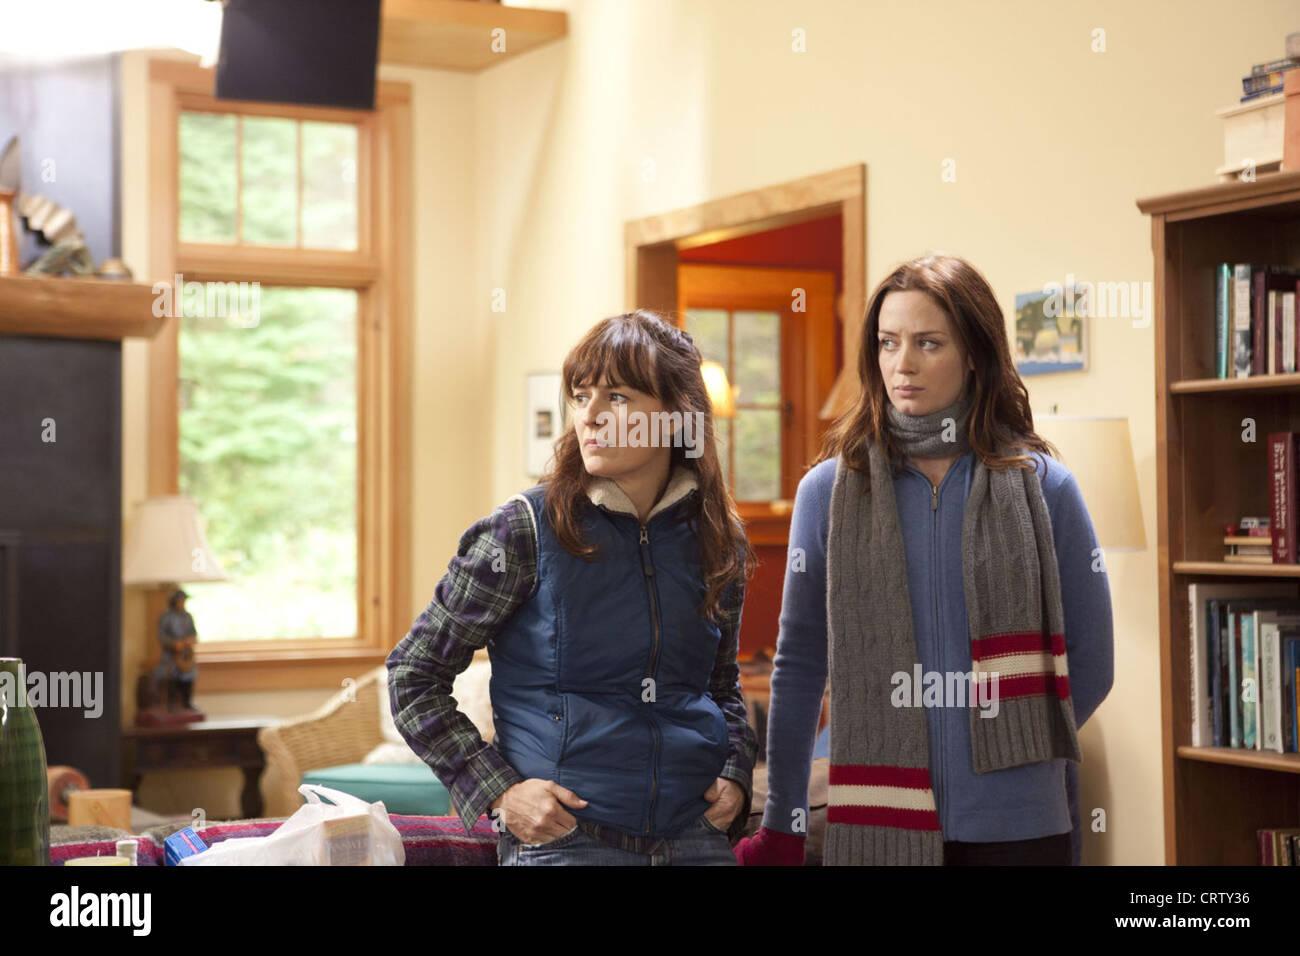 YOUR SISTER'S SISTER (2011) ROSEMARIE DEWITT, EMILY BLUNT, LYNN SHELTON (DIR) 001 MOVIESTORE COLLECTION LTD - Stock Image